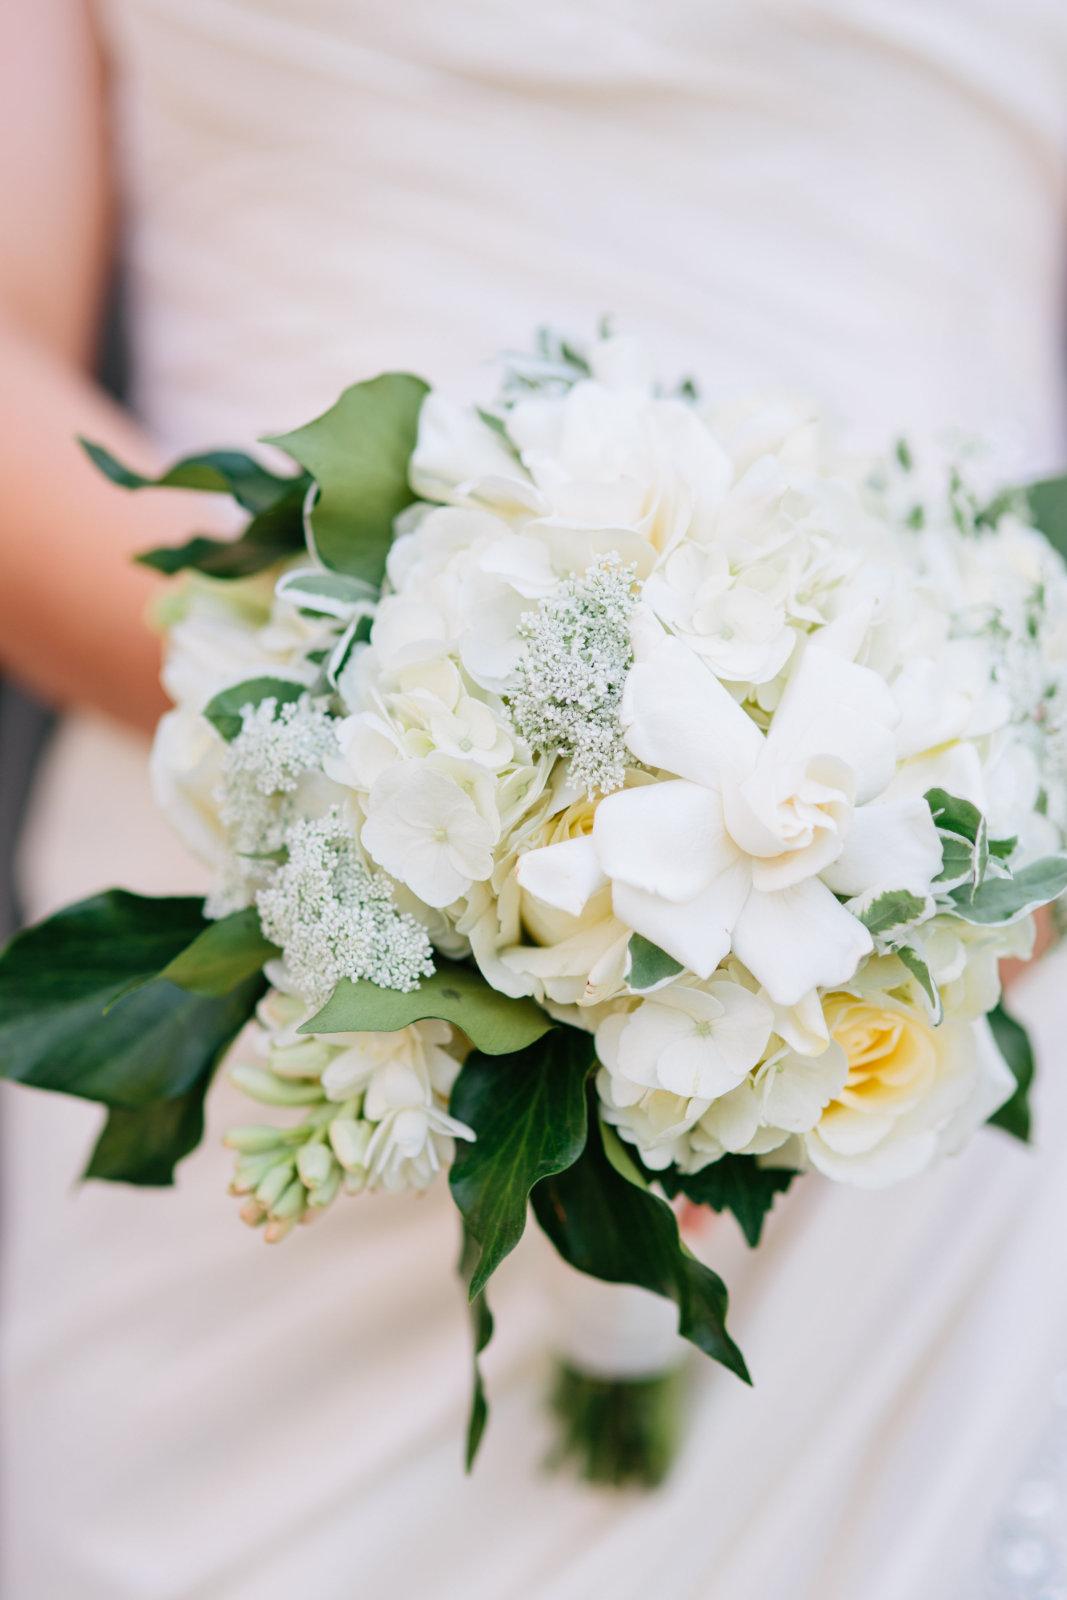 VJ-wedding-bouquet.jpg